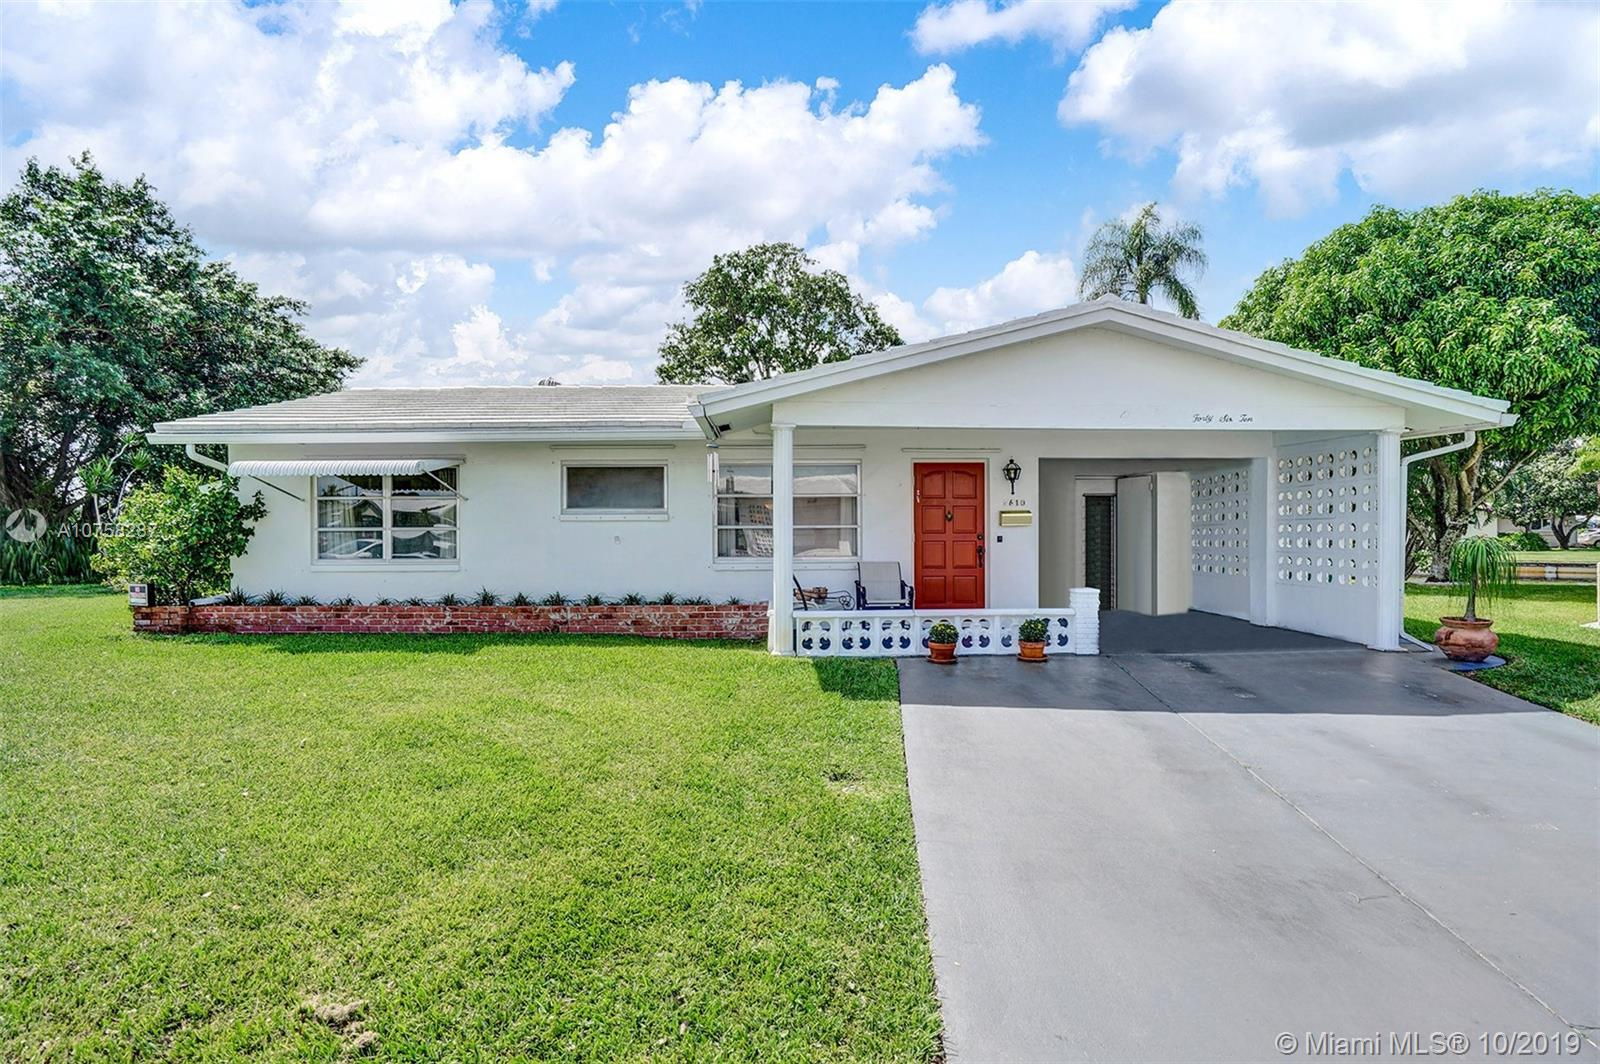 Property for sale at 4610 NW 45th Ct, Tamarac FL 33319, Tamarac,  Florida 33319